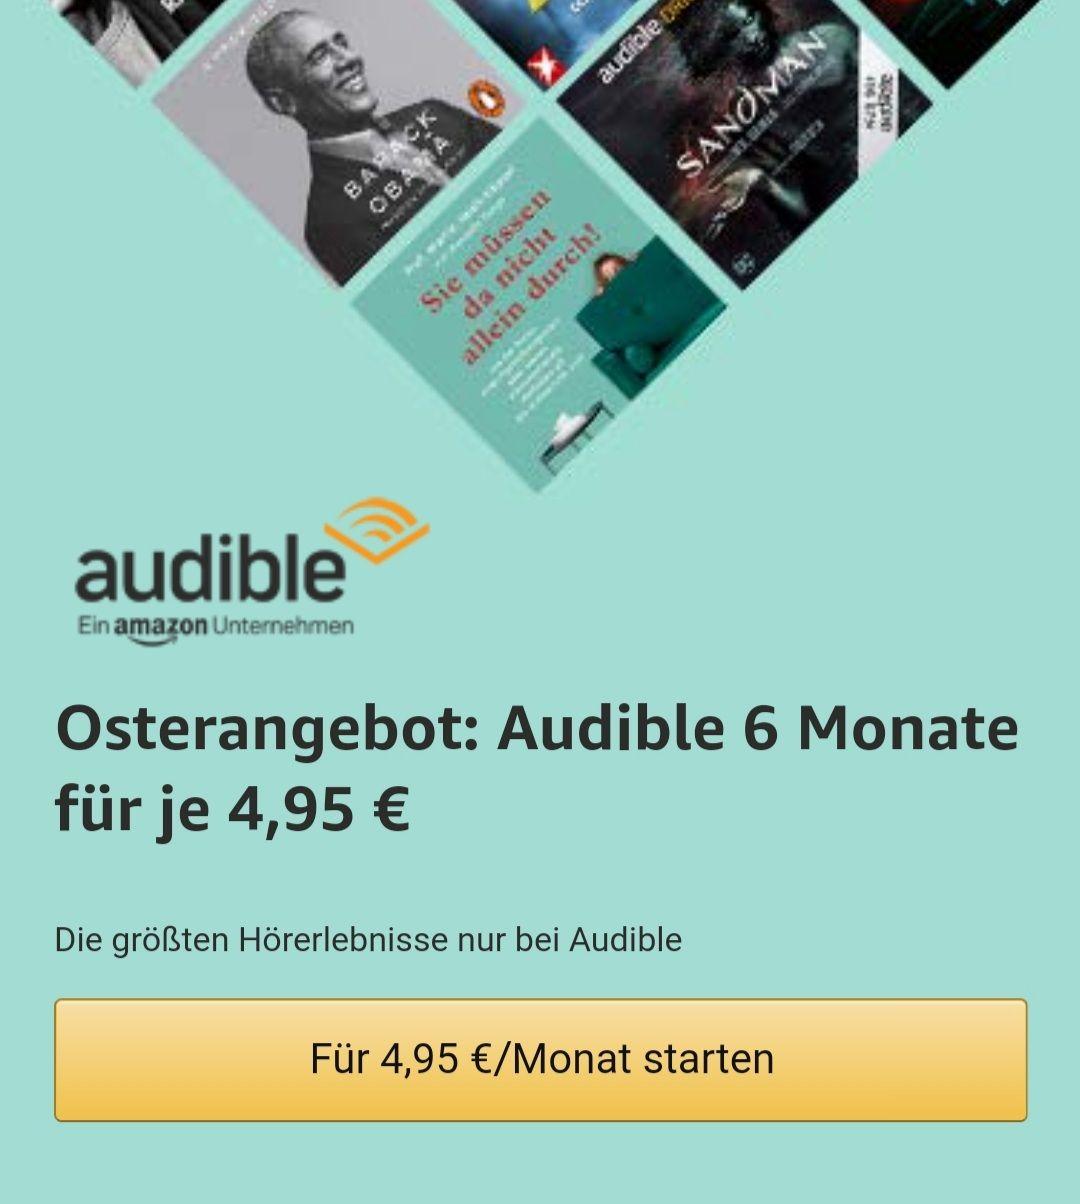 Audible Oster Spezial 6 Monate 4,95€ Pro Monat Neukunden